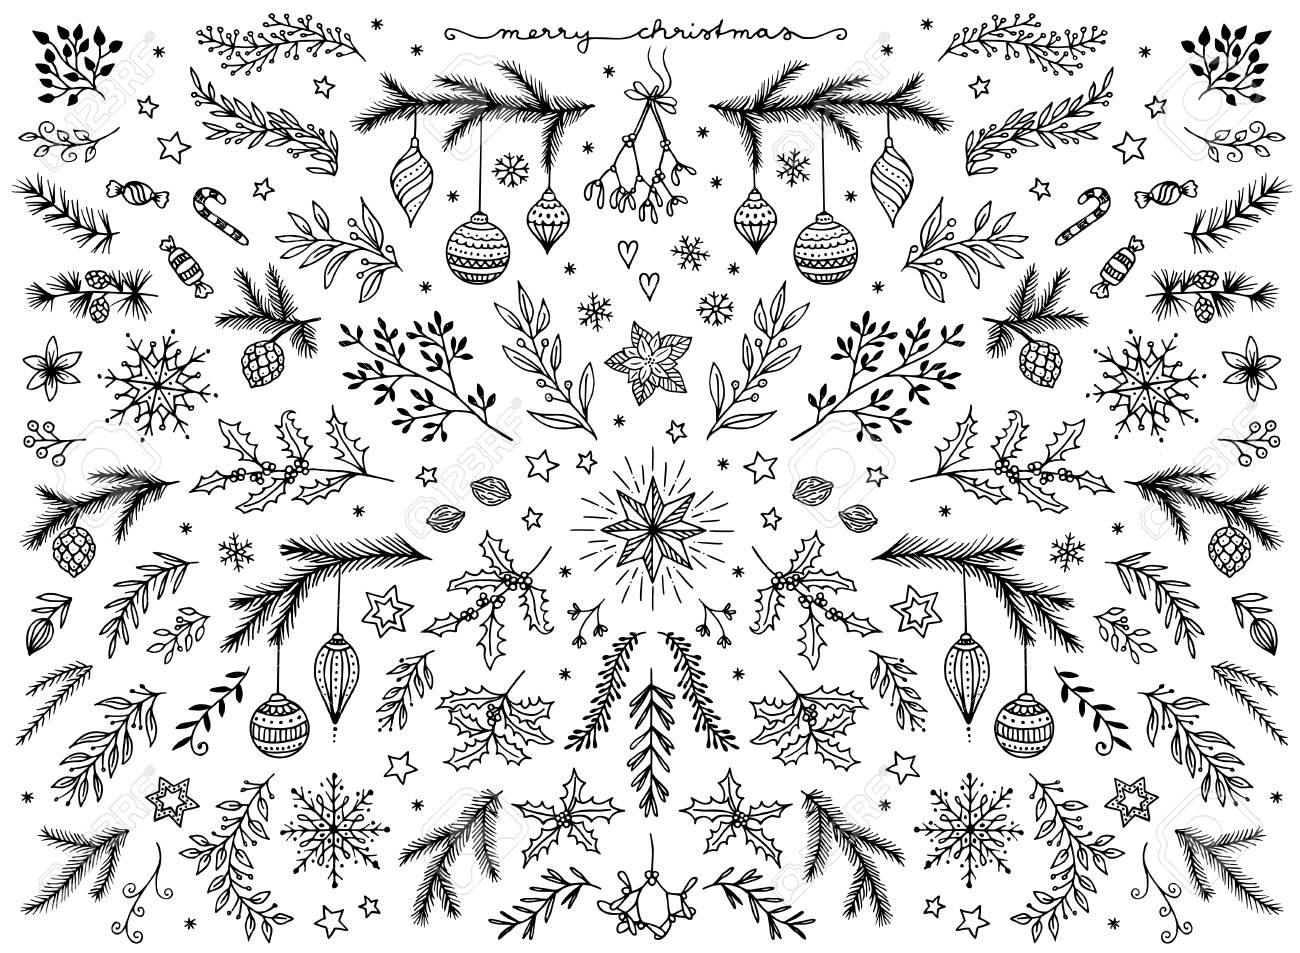 Hand sketched floral design elements for Christmas - 88602370